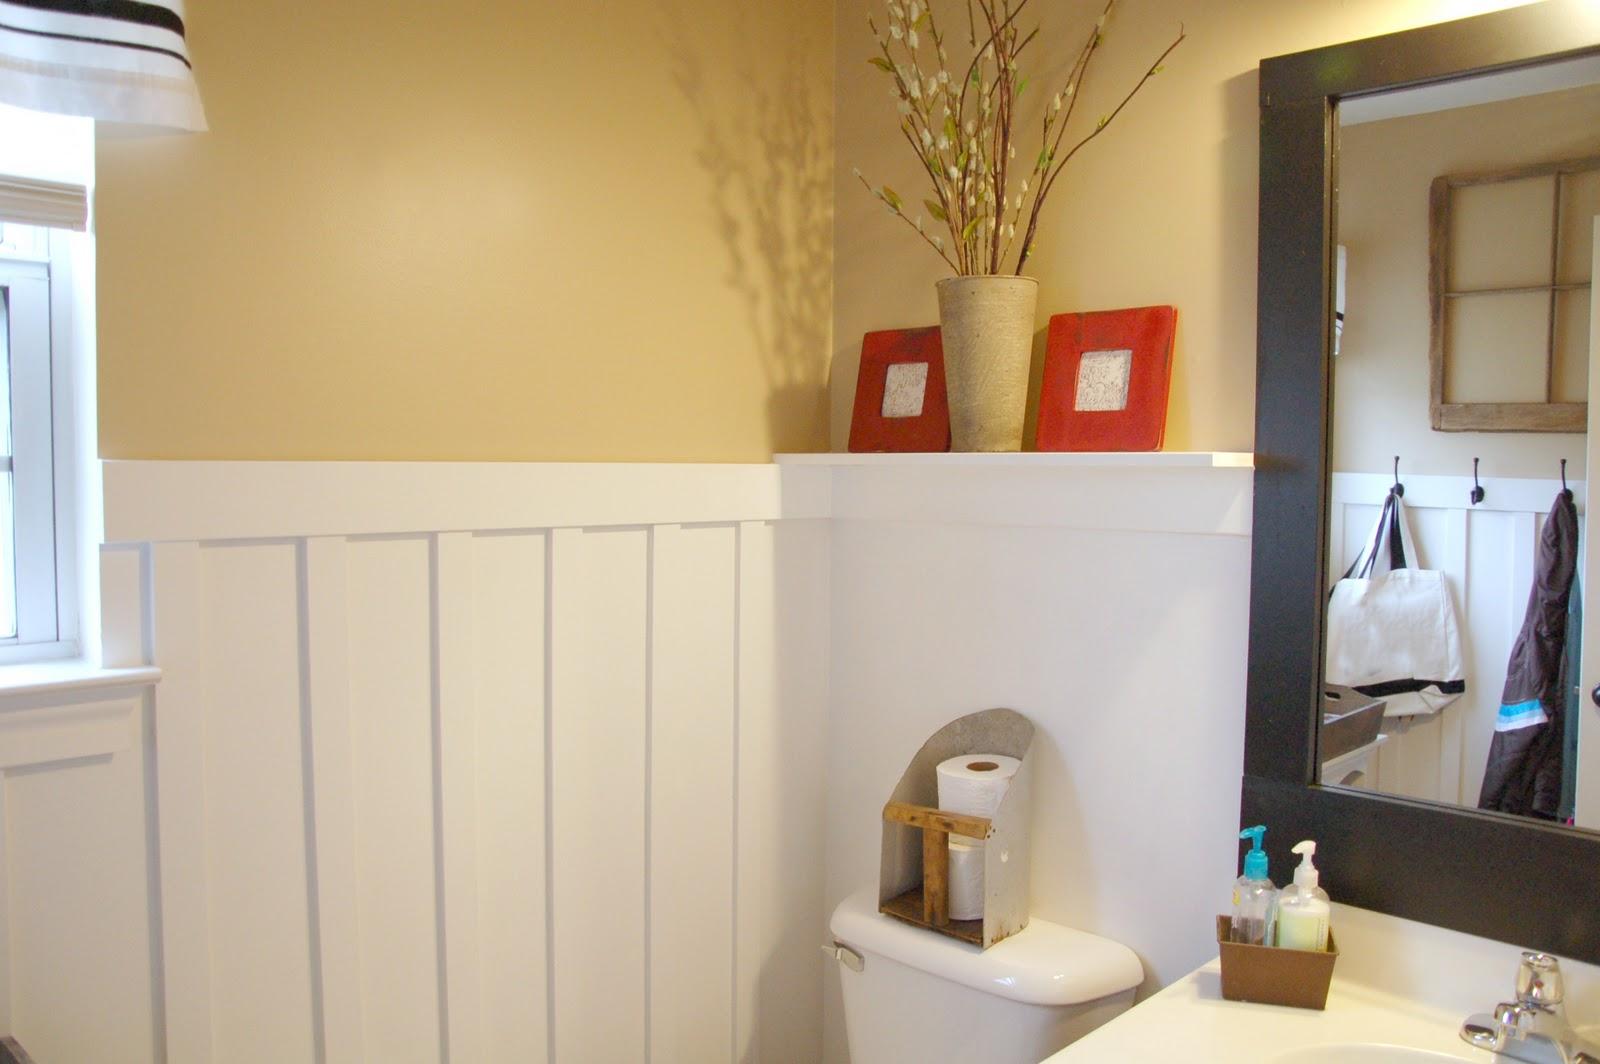 she 39 s crafty bathroom redo. Black Bedroom Furniture Sets. Home Design Ideas